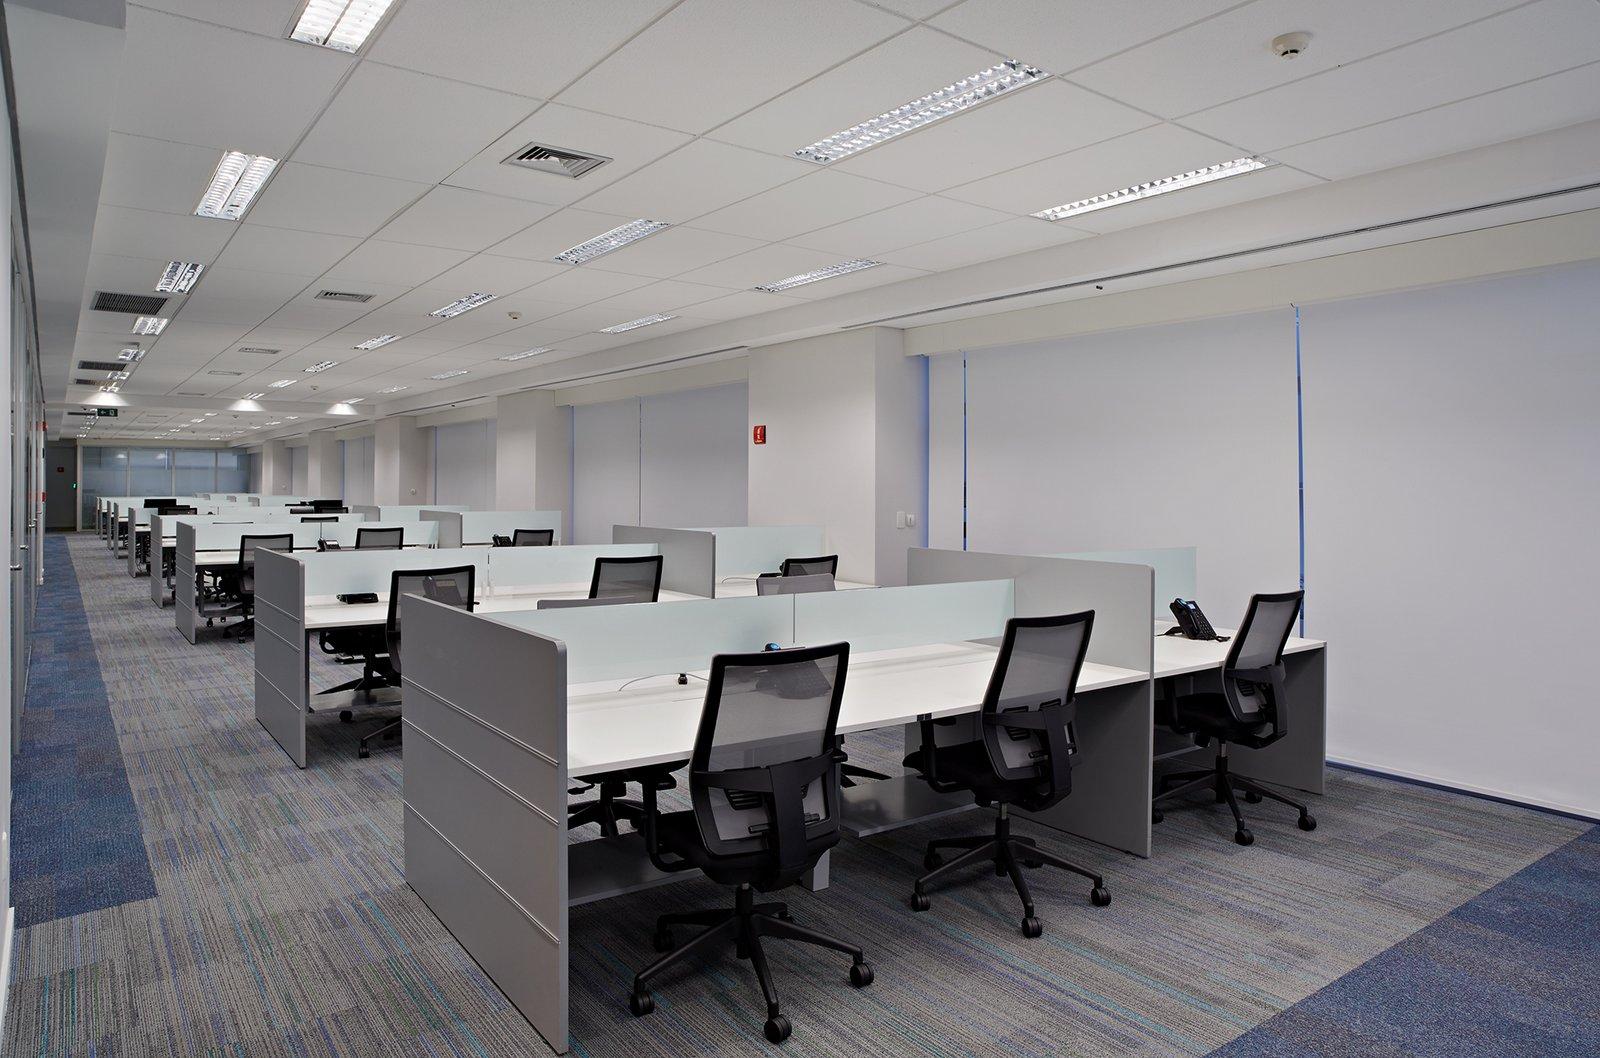 aluminum management chair posture care company sa deloitte offices - são paulo office snapshots